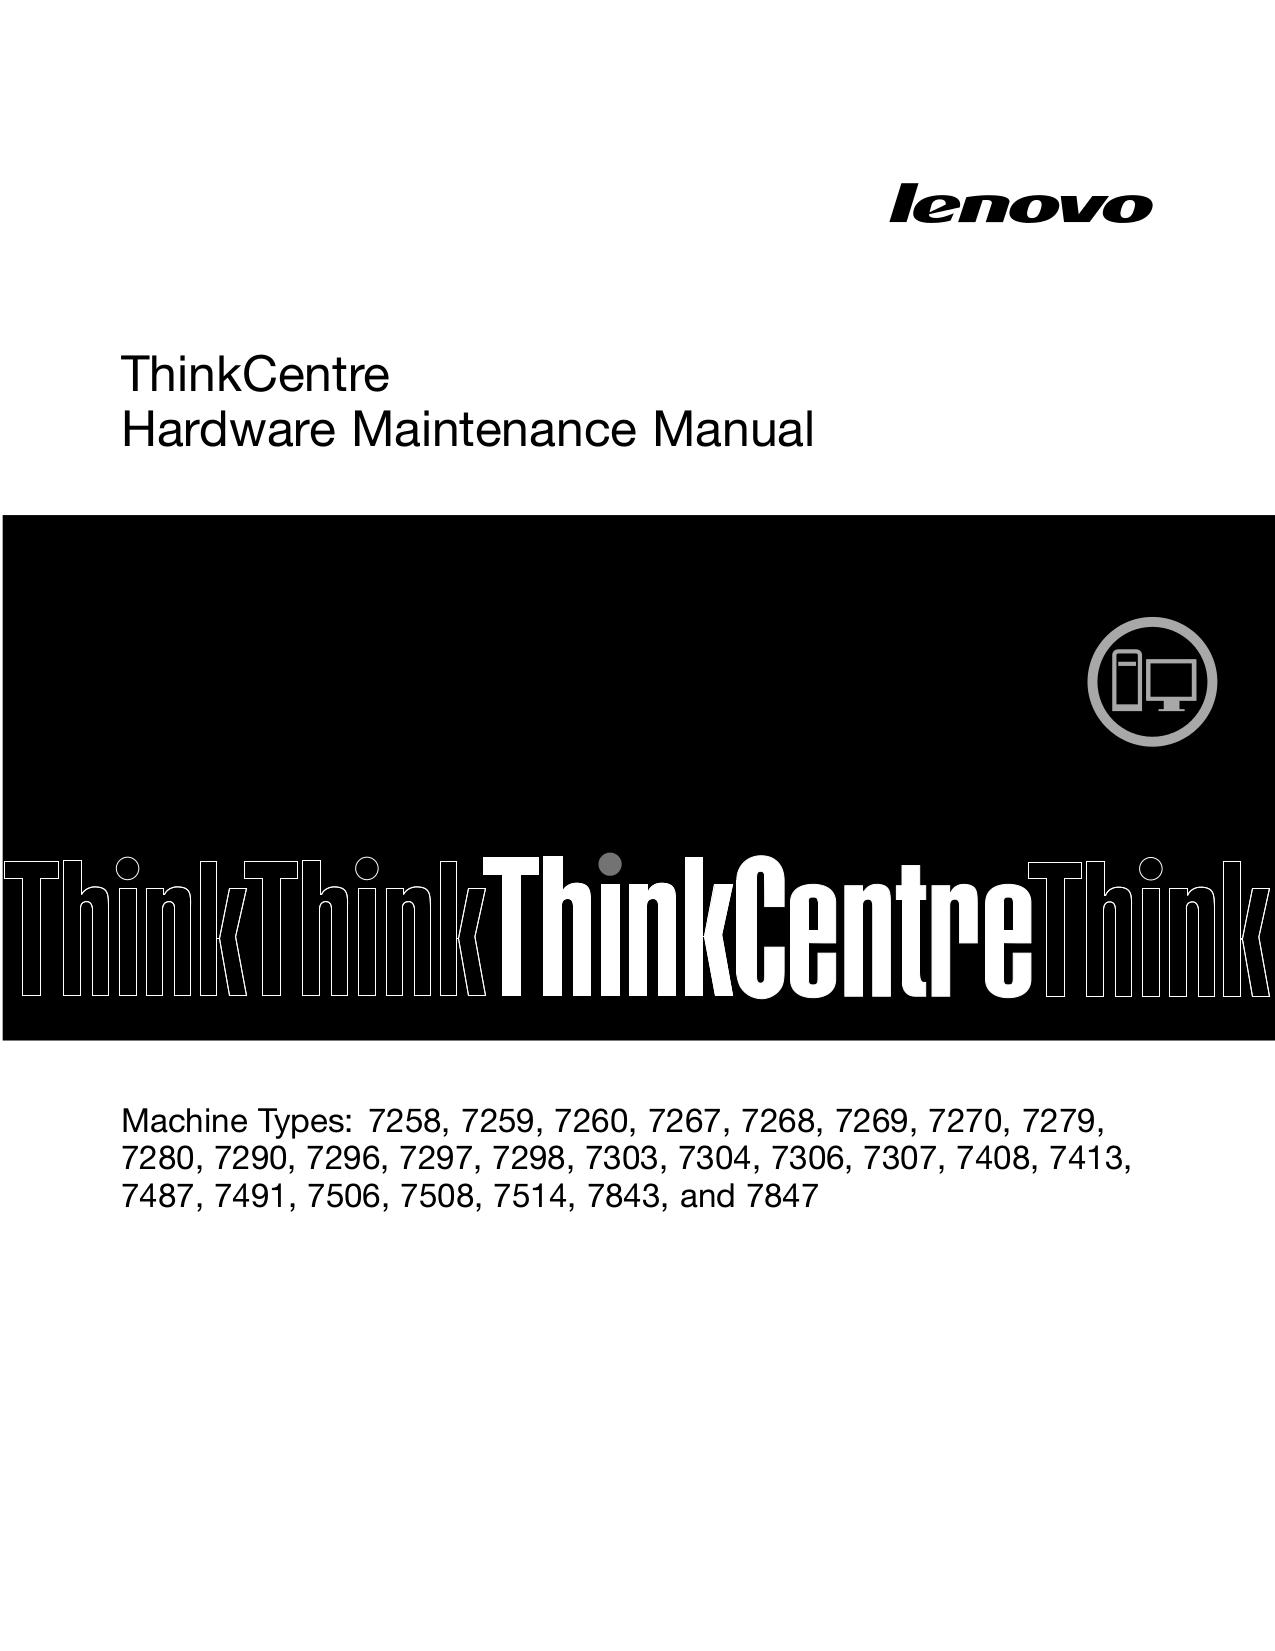 pdf for Lenovo Desktop ThinkCentre M58e 7269 manual